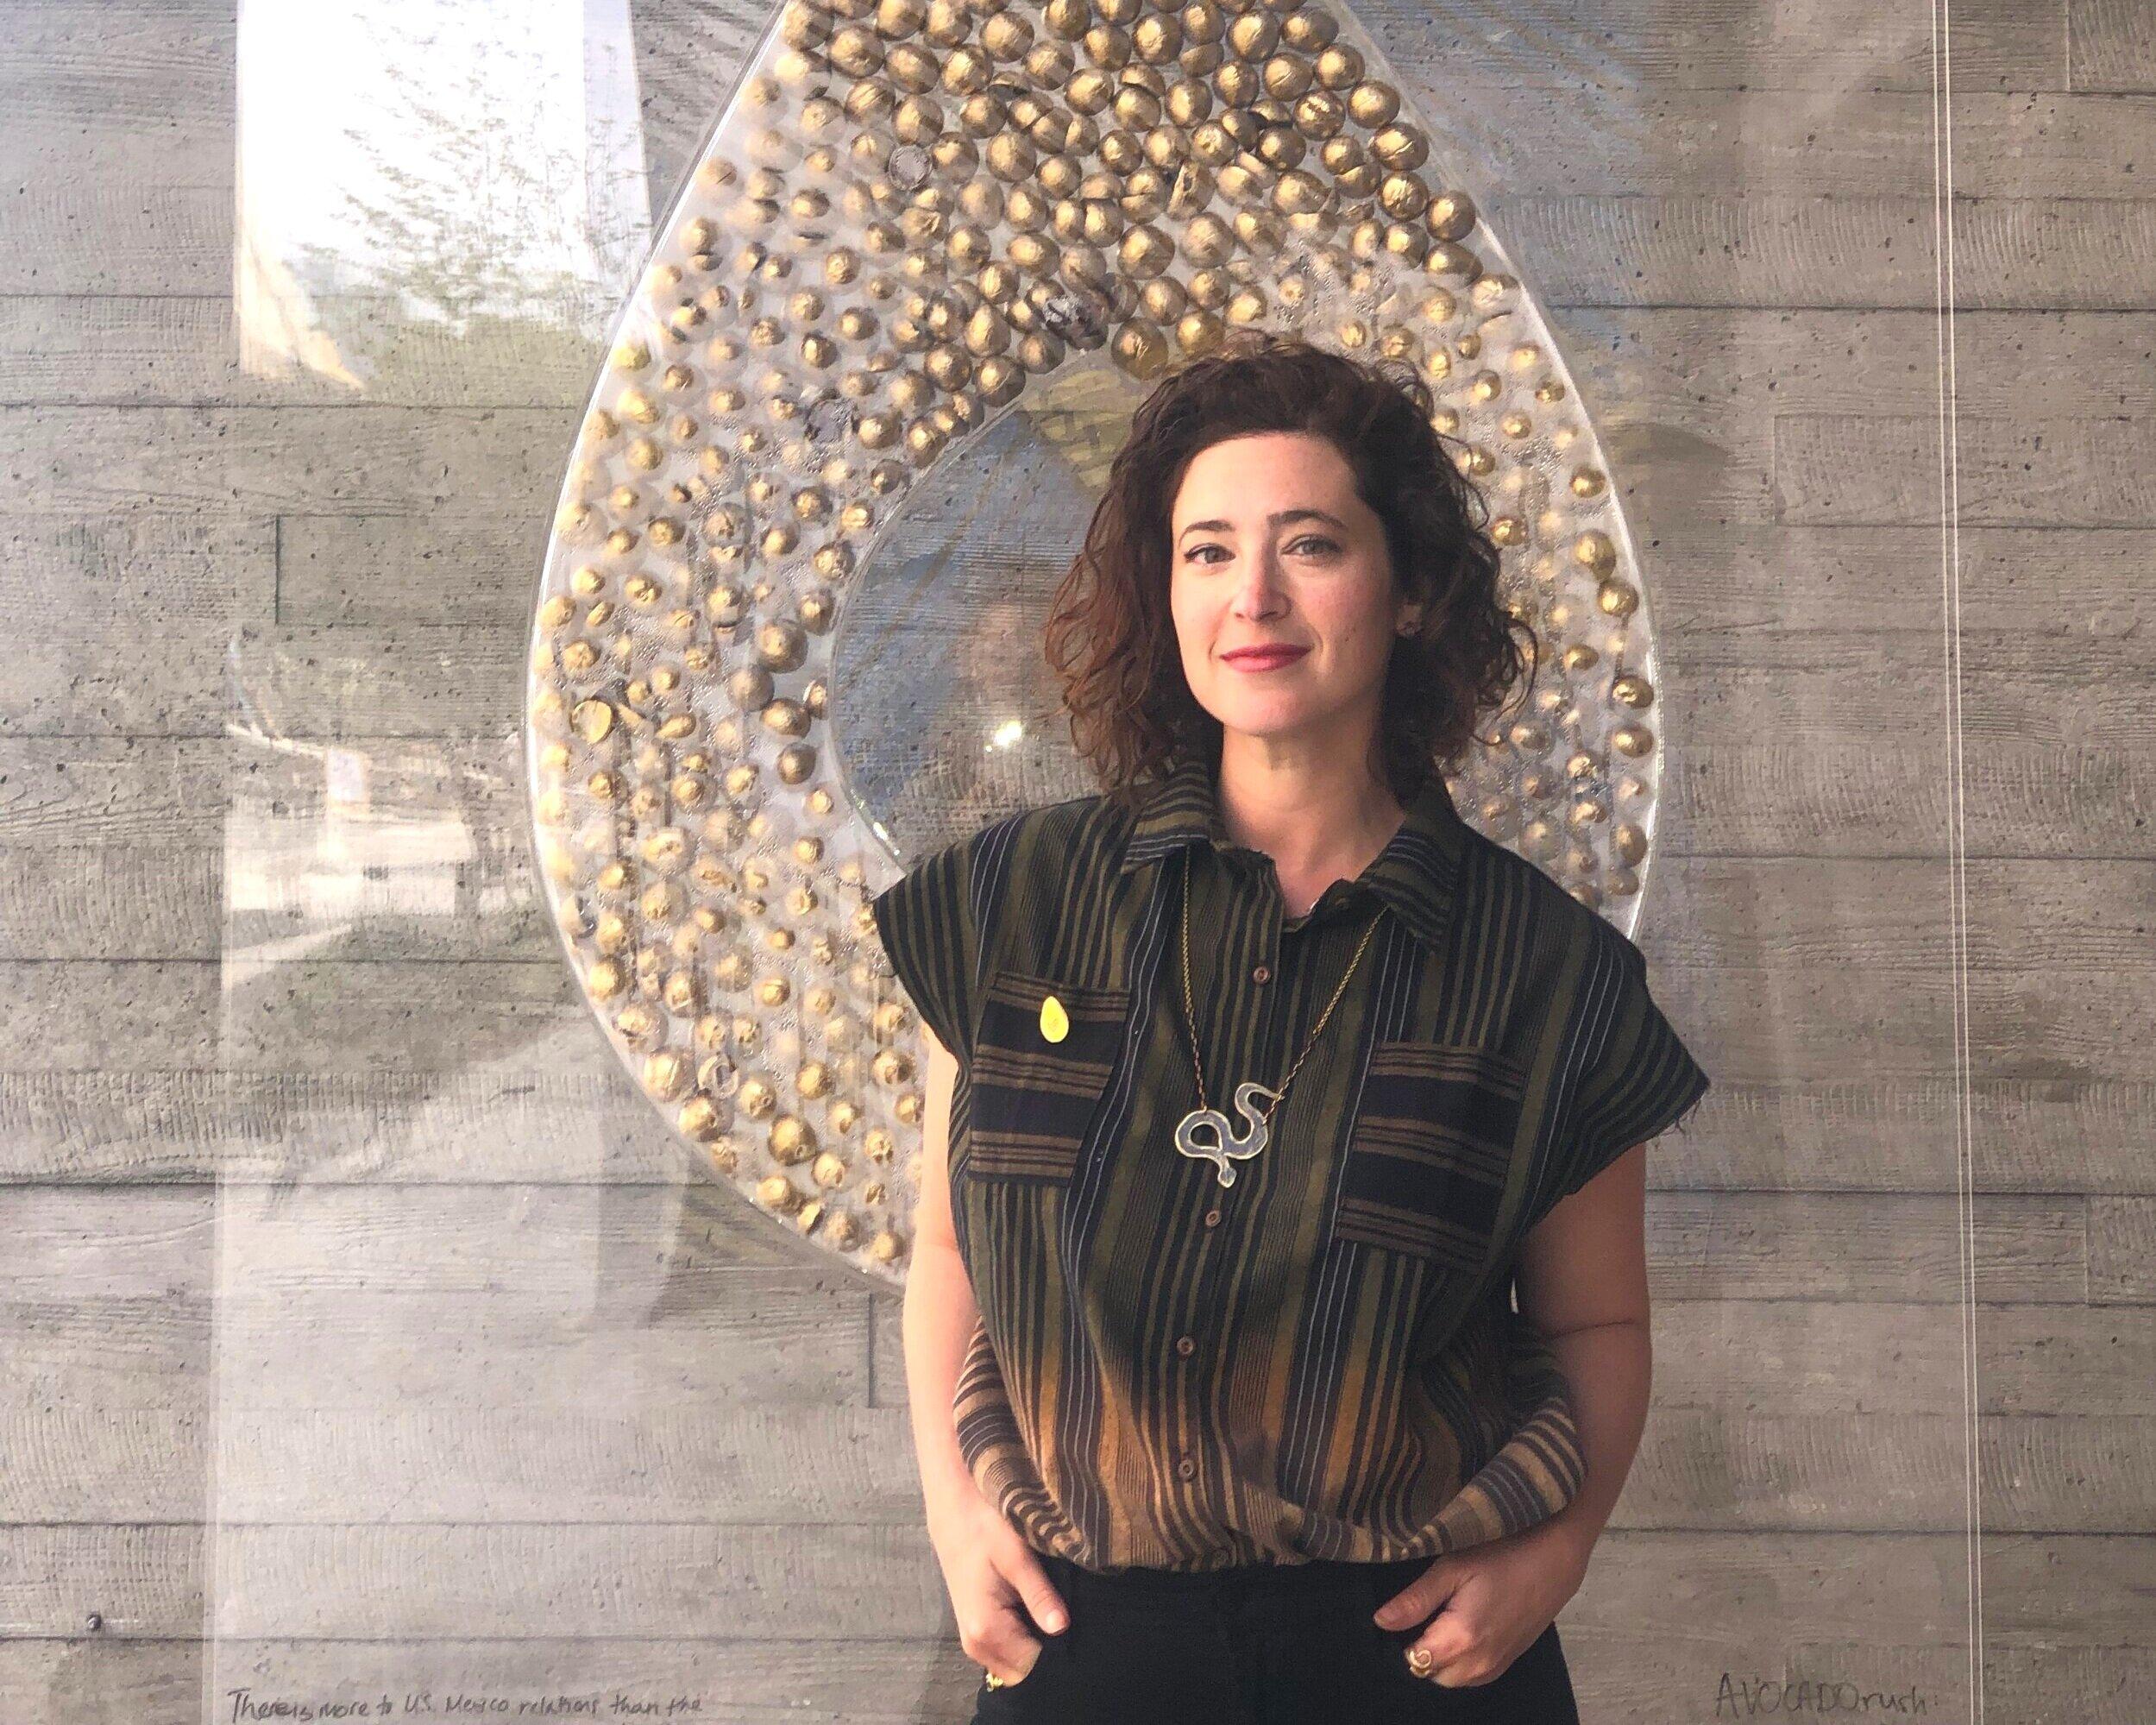 Erica Berger - Los Angeles based award-winning journalist, media entrepreneur, artist, investor, and Kundalini yoga and meditation teacher.